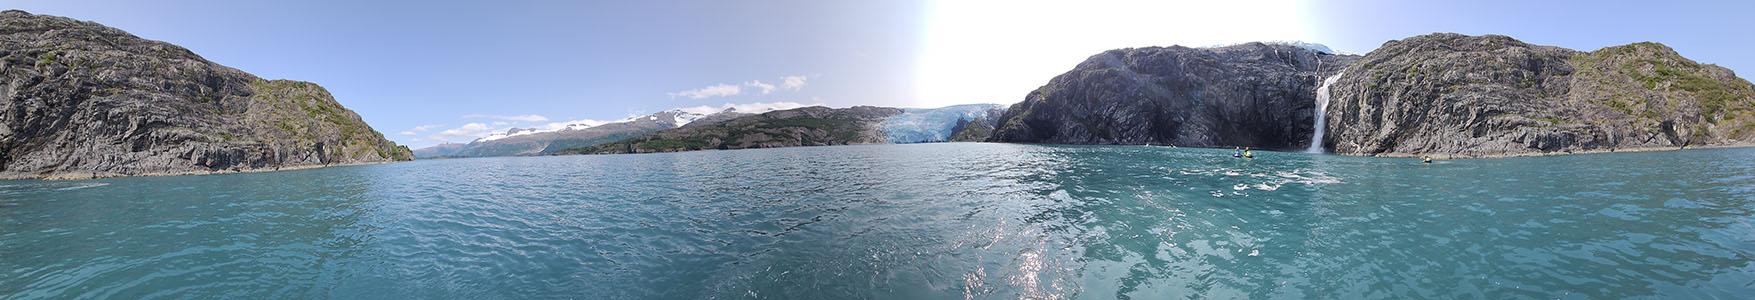 Contact Kenai Riverside Resort - Panoramic of Blackstone Glacier, Whittier Alaska